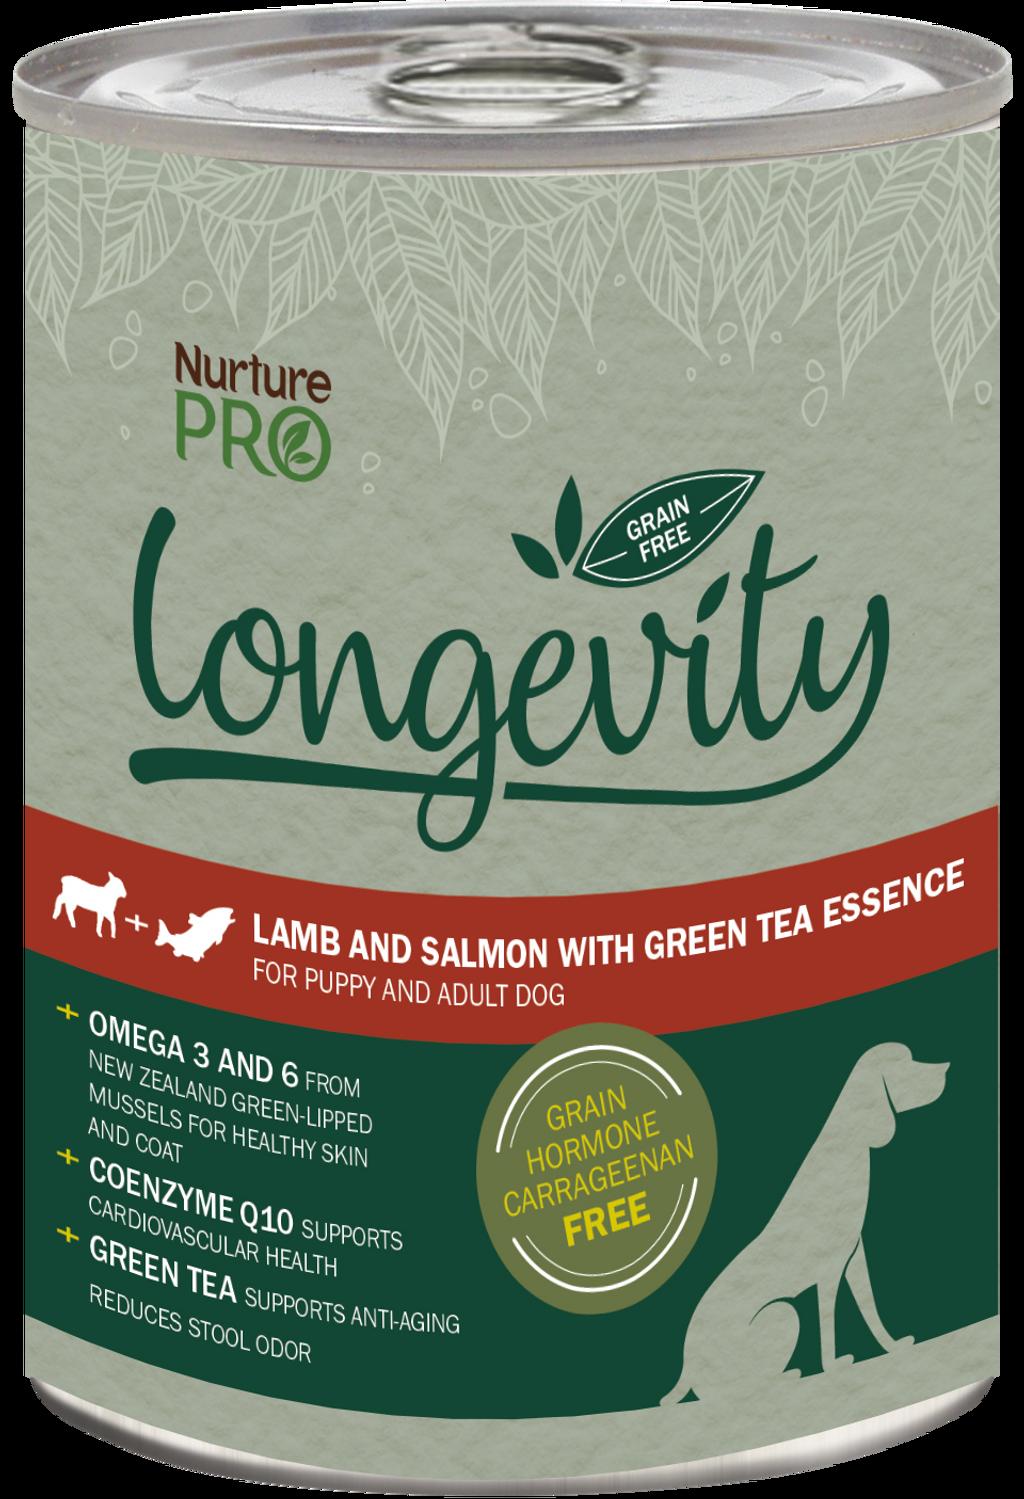 longevity_Lamb_Canned.png